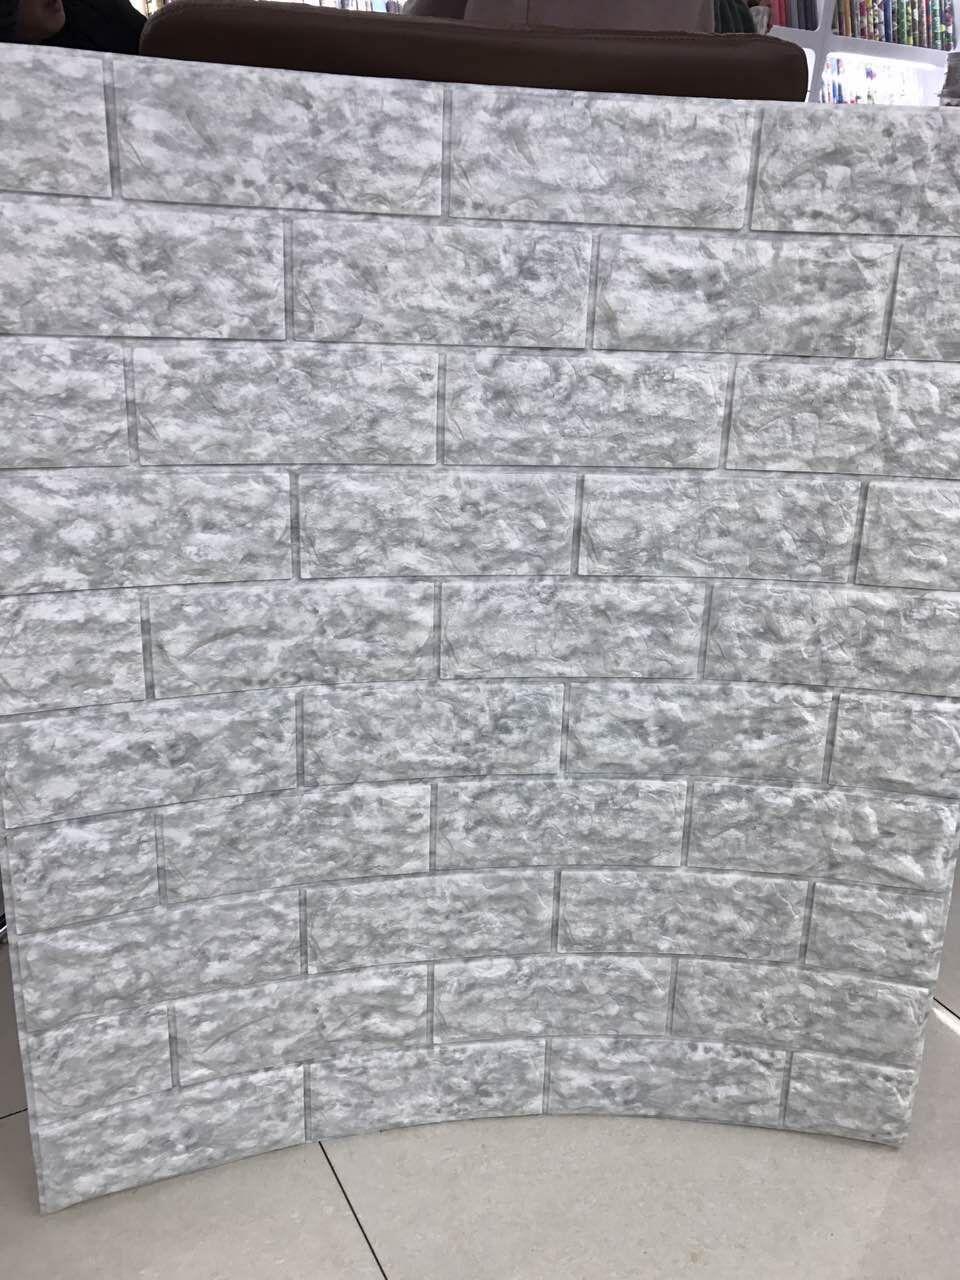 3d Wall Paper Embossed Decorative Wall Skin 3d Lightweight Pe Foam Wallpaper China Pe Foam 3d Wall Sticker Manufacturer 3d Wall Wall Stickers 3d Wall Panels